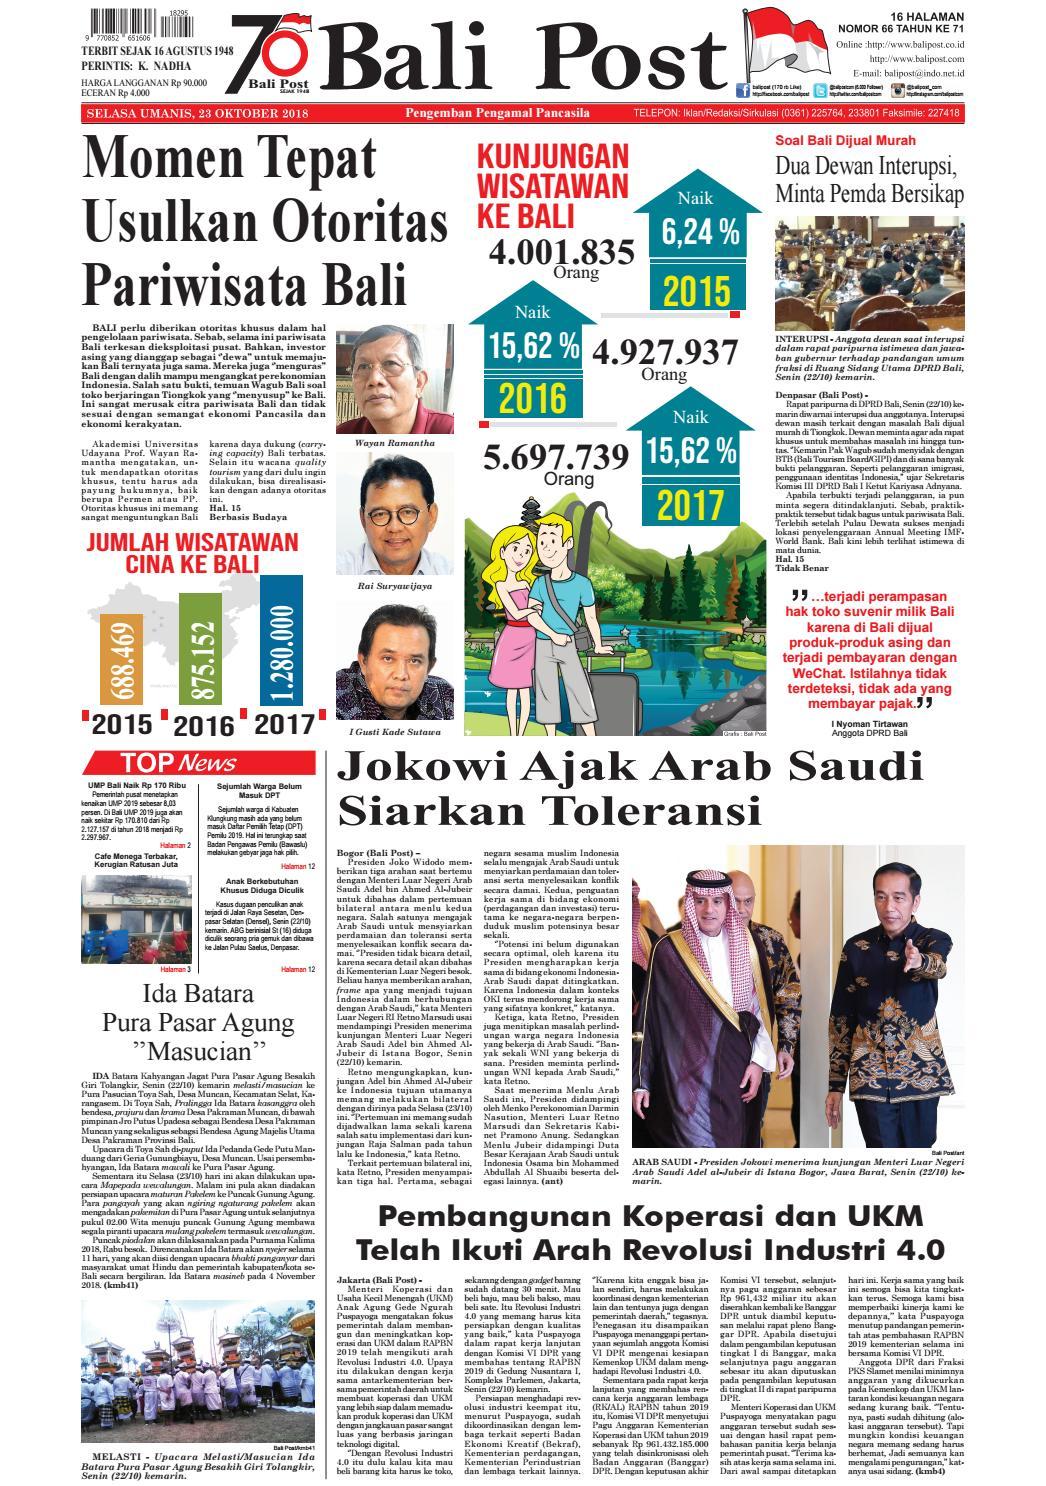 Edisi Selasa 23 Oktober 2018  c49224e415